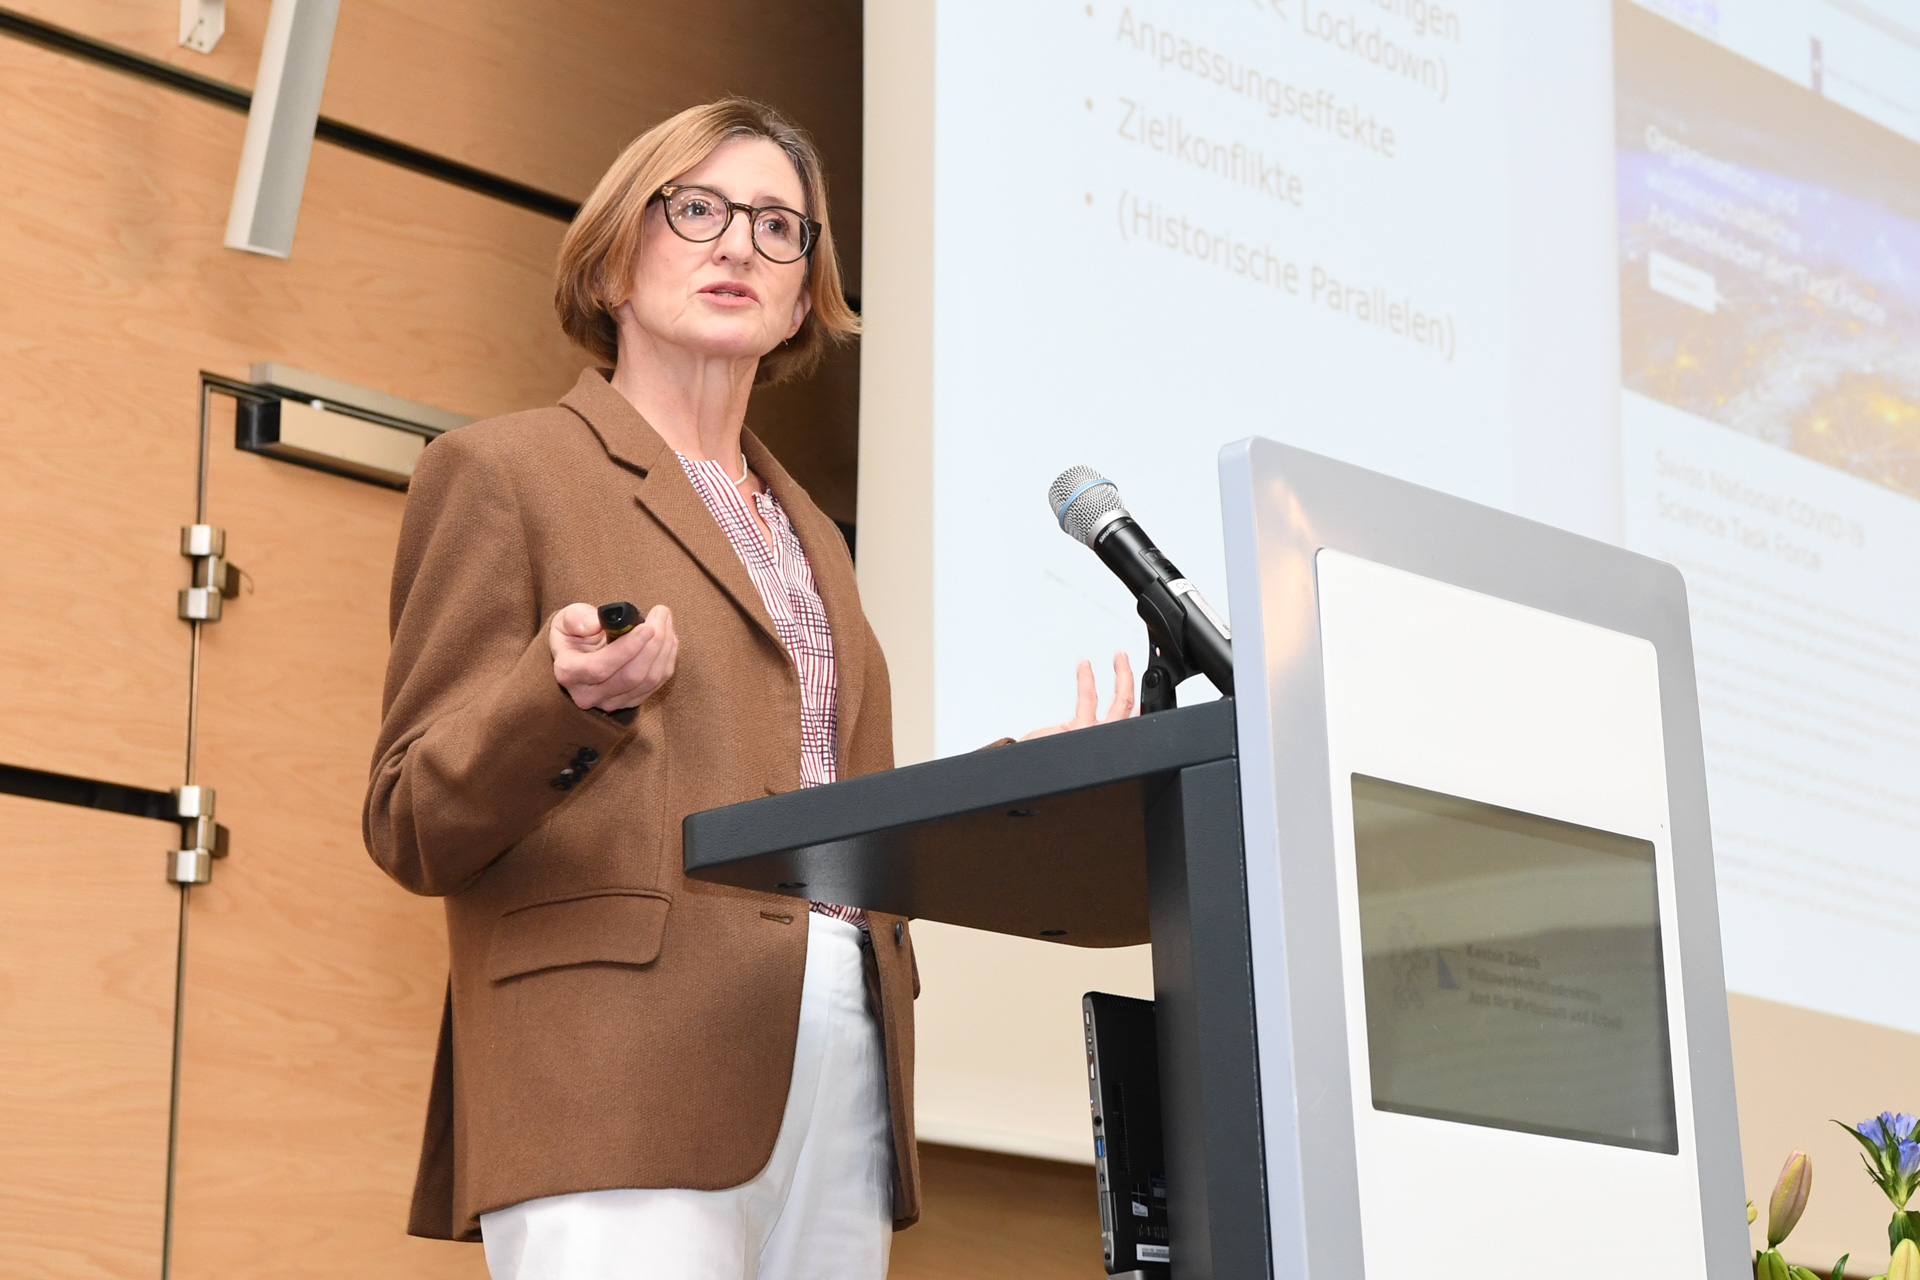 Bild: Andreas Bucher; Referentin Prof. Dr. Monika Bütler